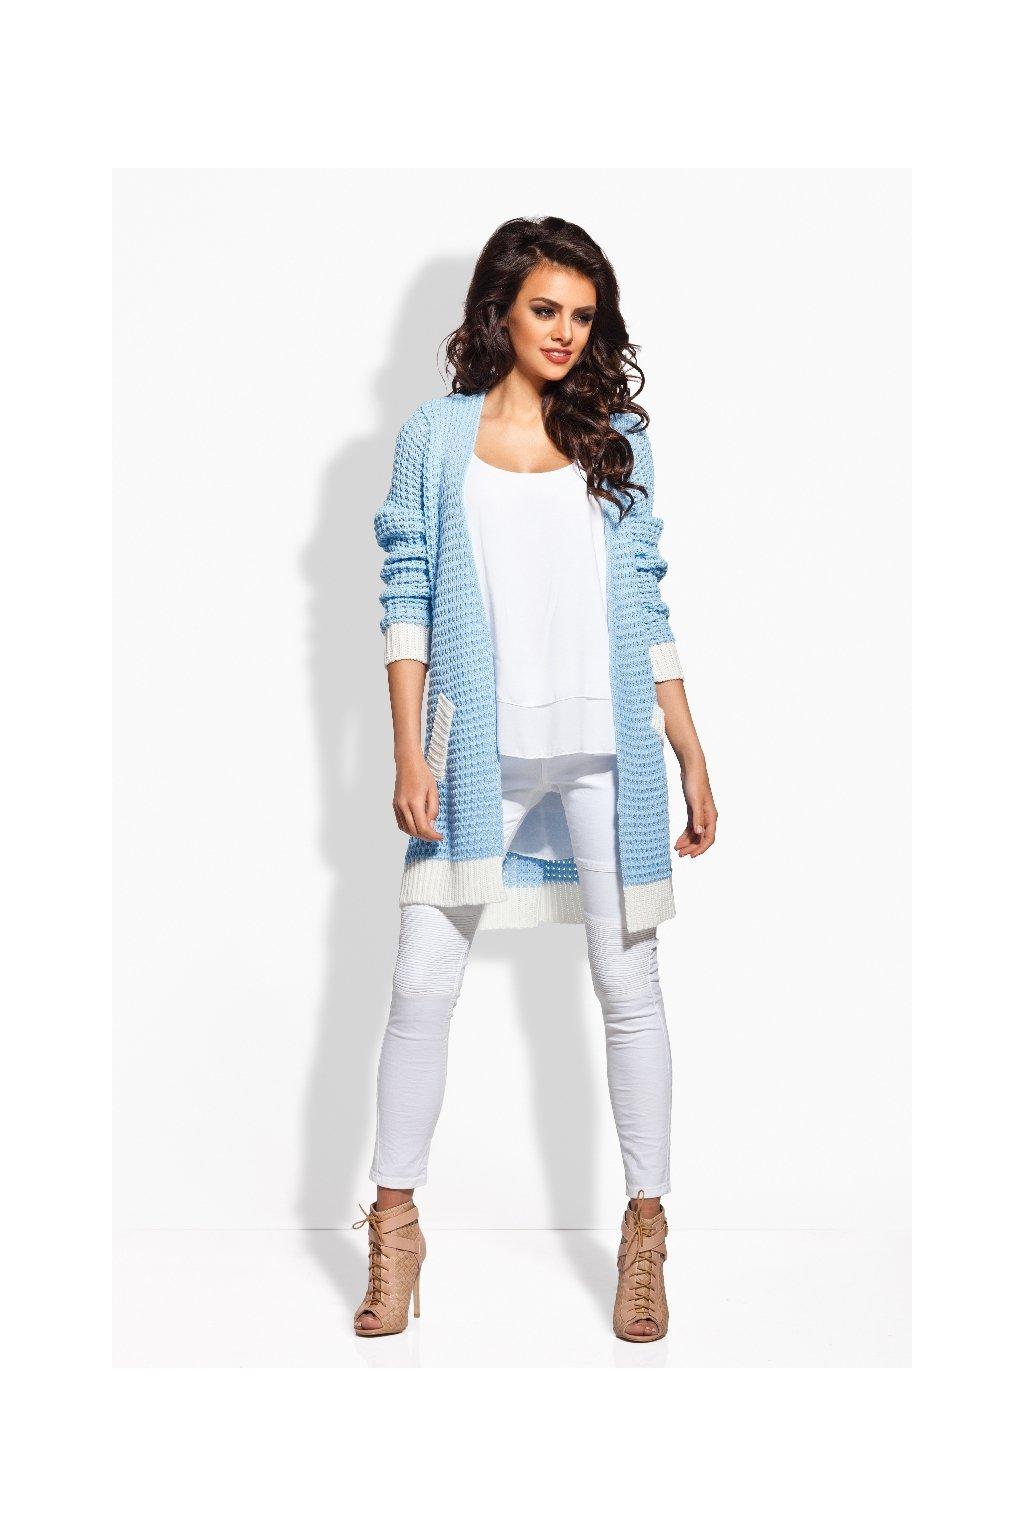 Dámský pletený kabátek Lemoniade LS163 modrý